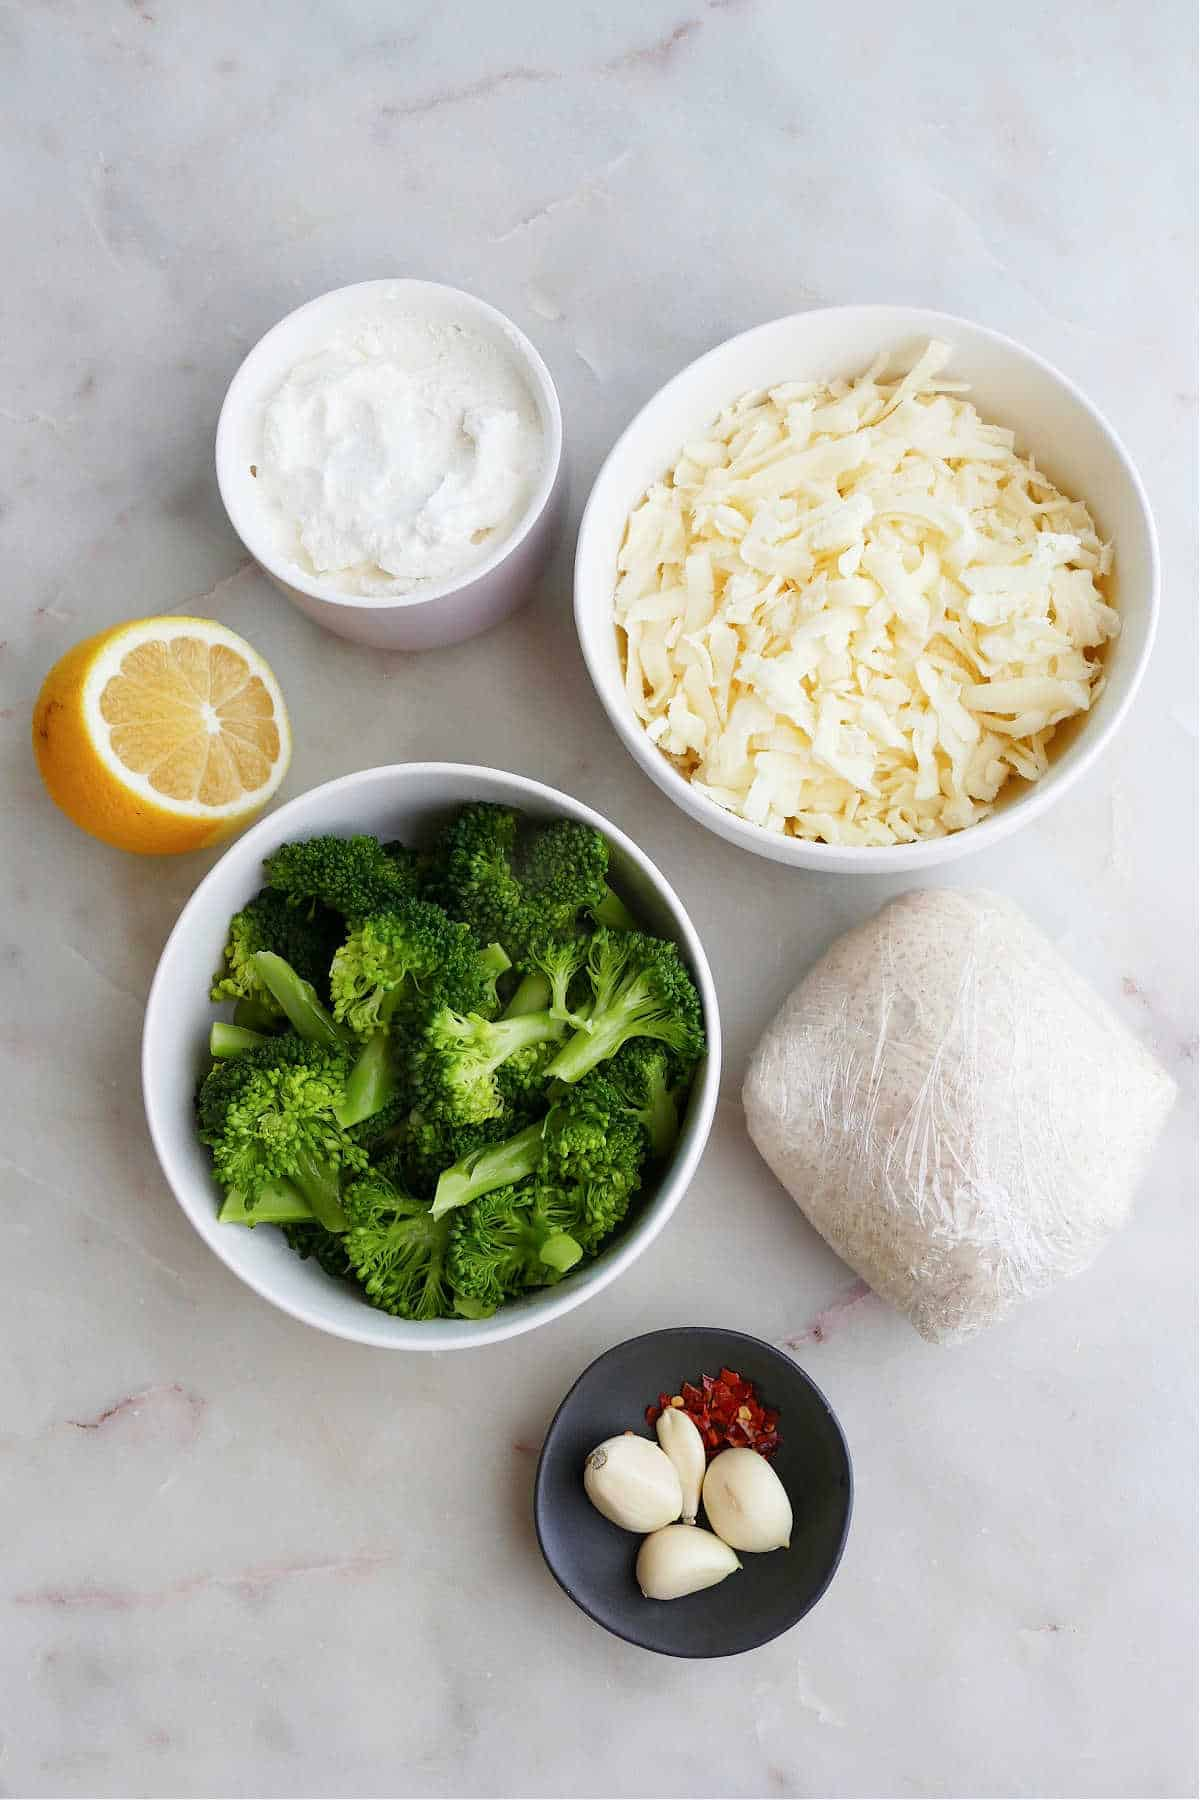 ricotta cheese, mozzarella, broccoli, pizza dough, lemon, garlic, and red pepper flakes on a counter